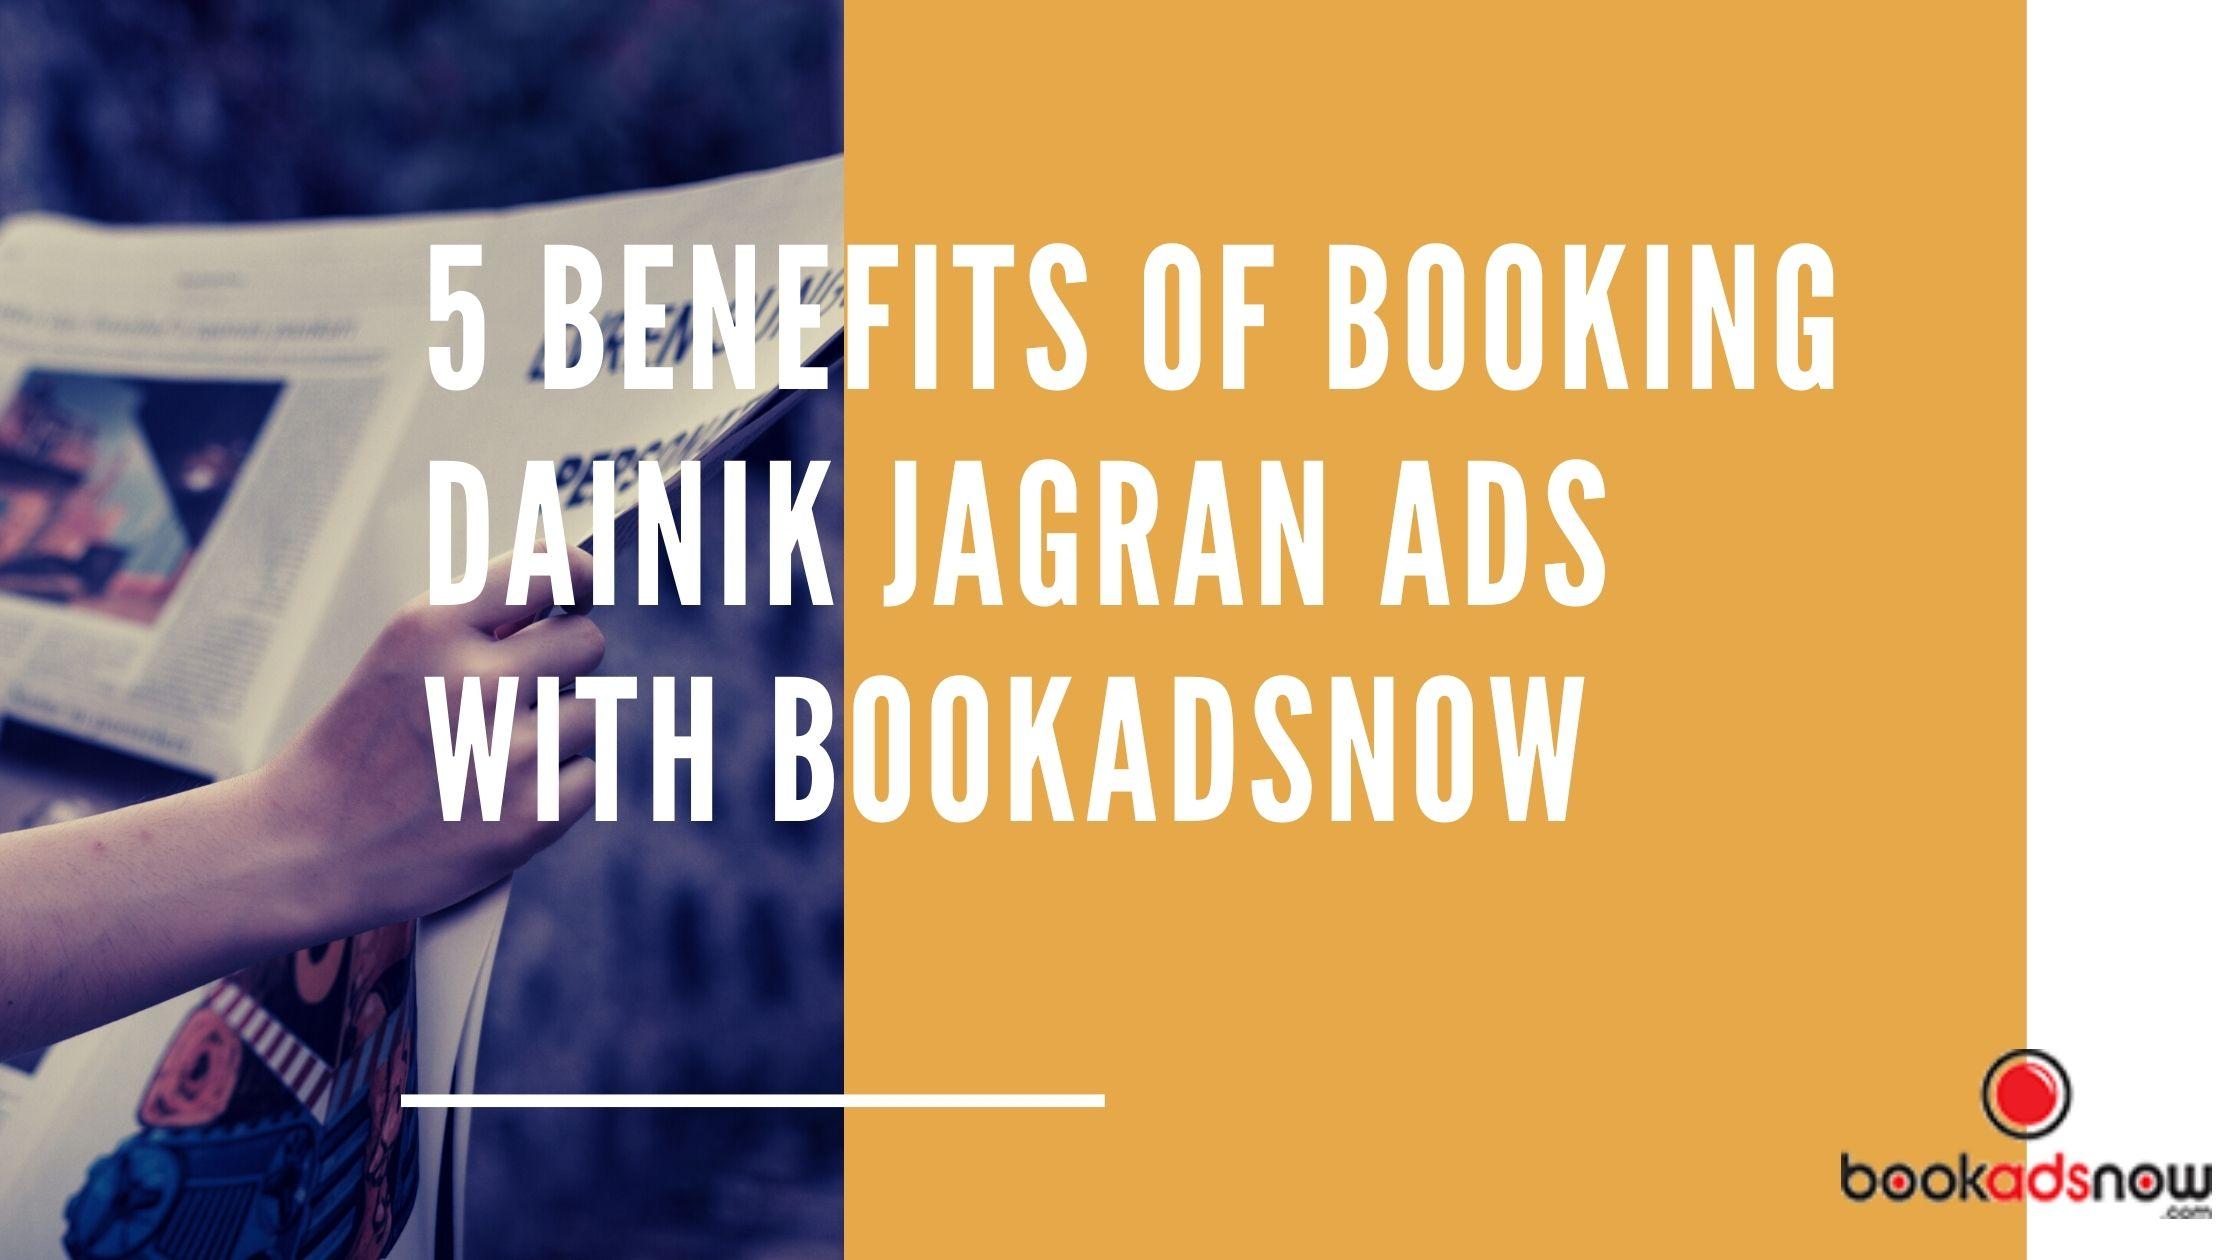 Dainik Jagran with Bookads